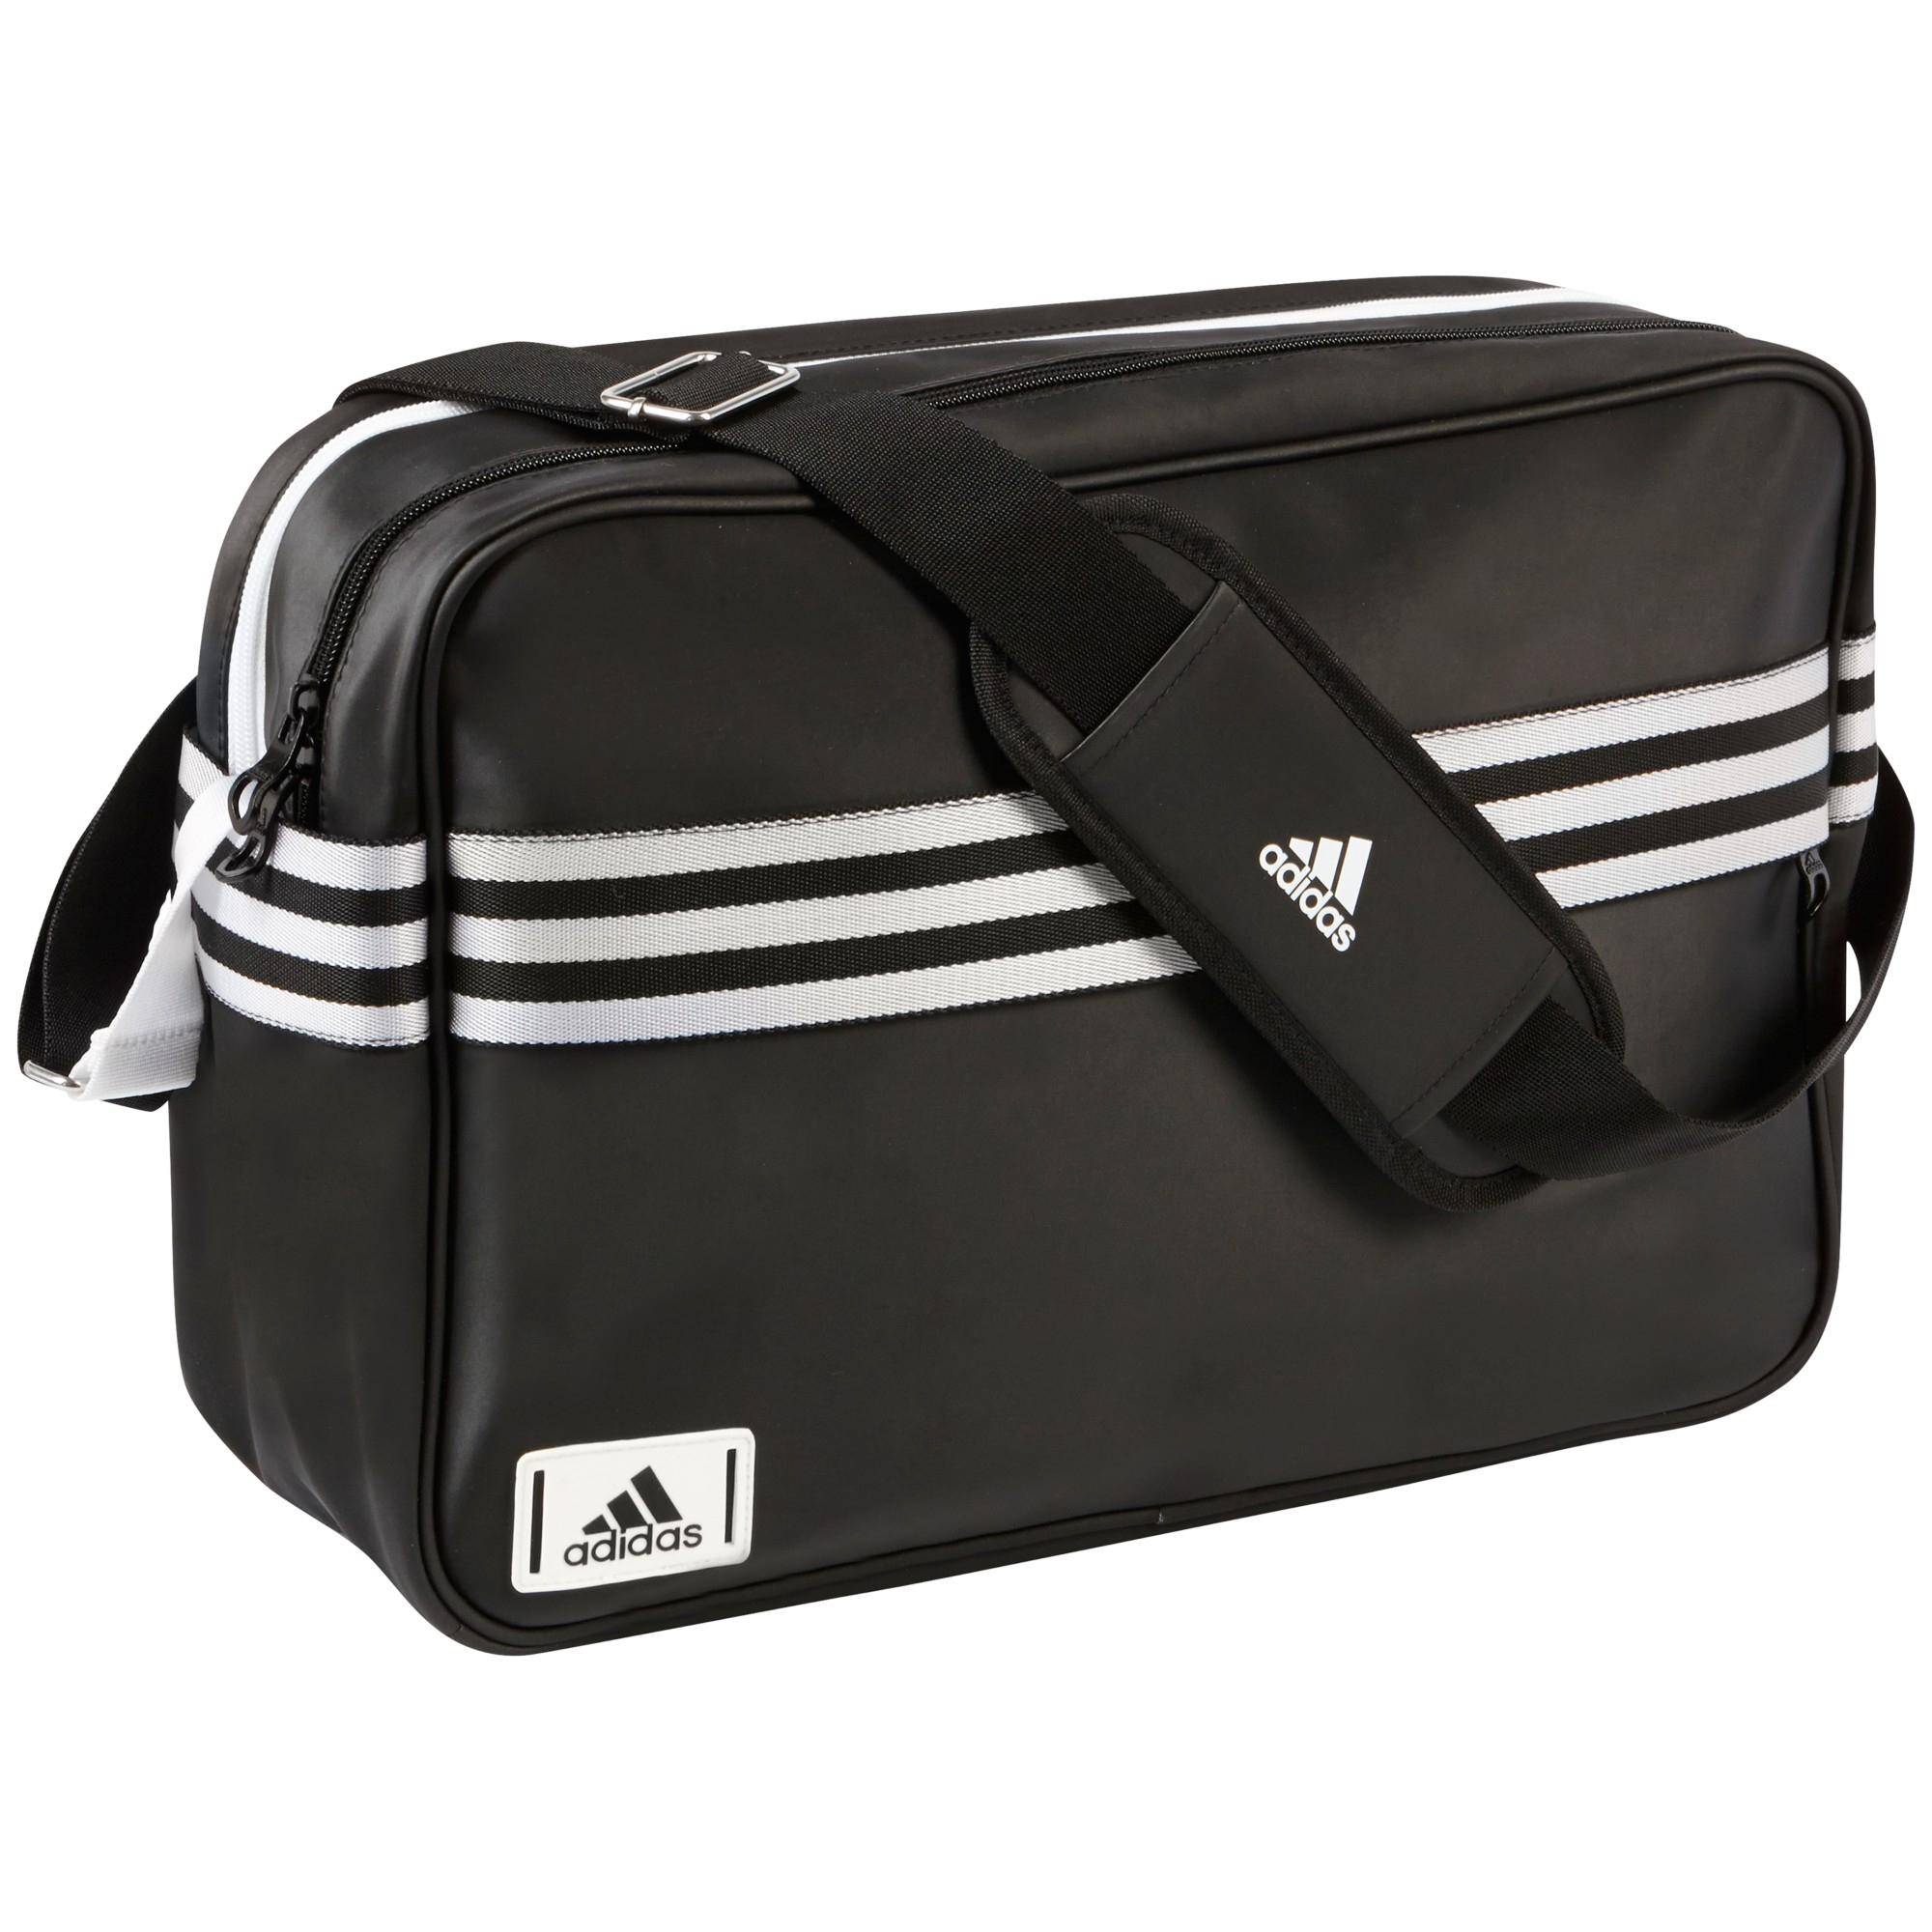 08961694de adidas Enamel Messenger Bag in Black for Men - Lyst